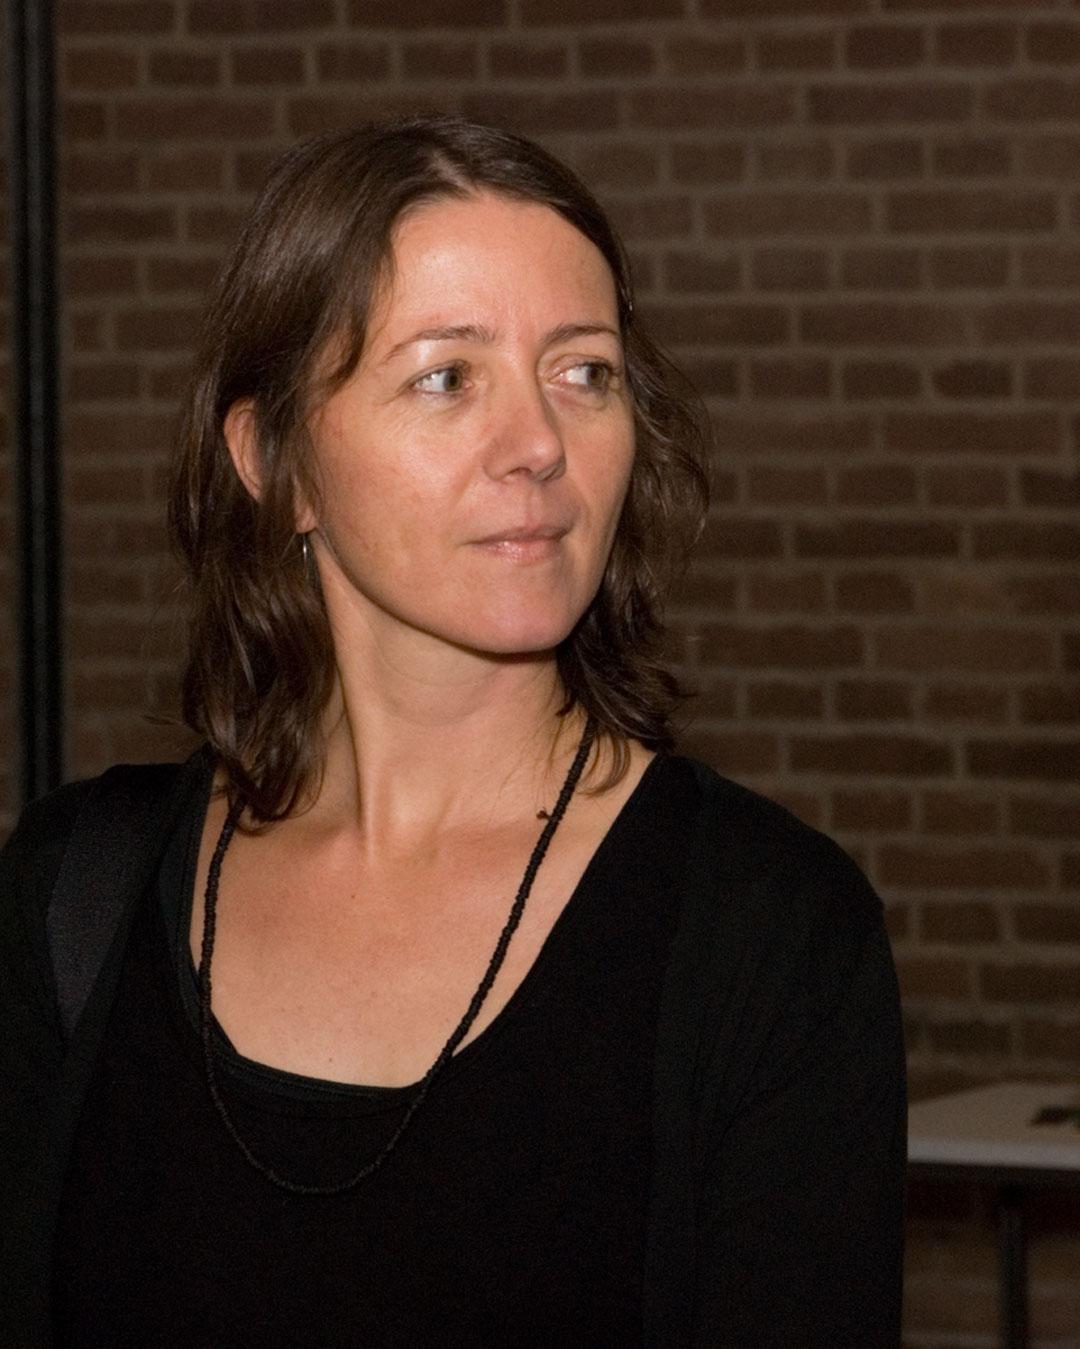 Karin Seufert, 2009